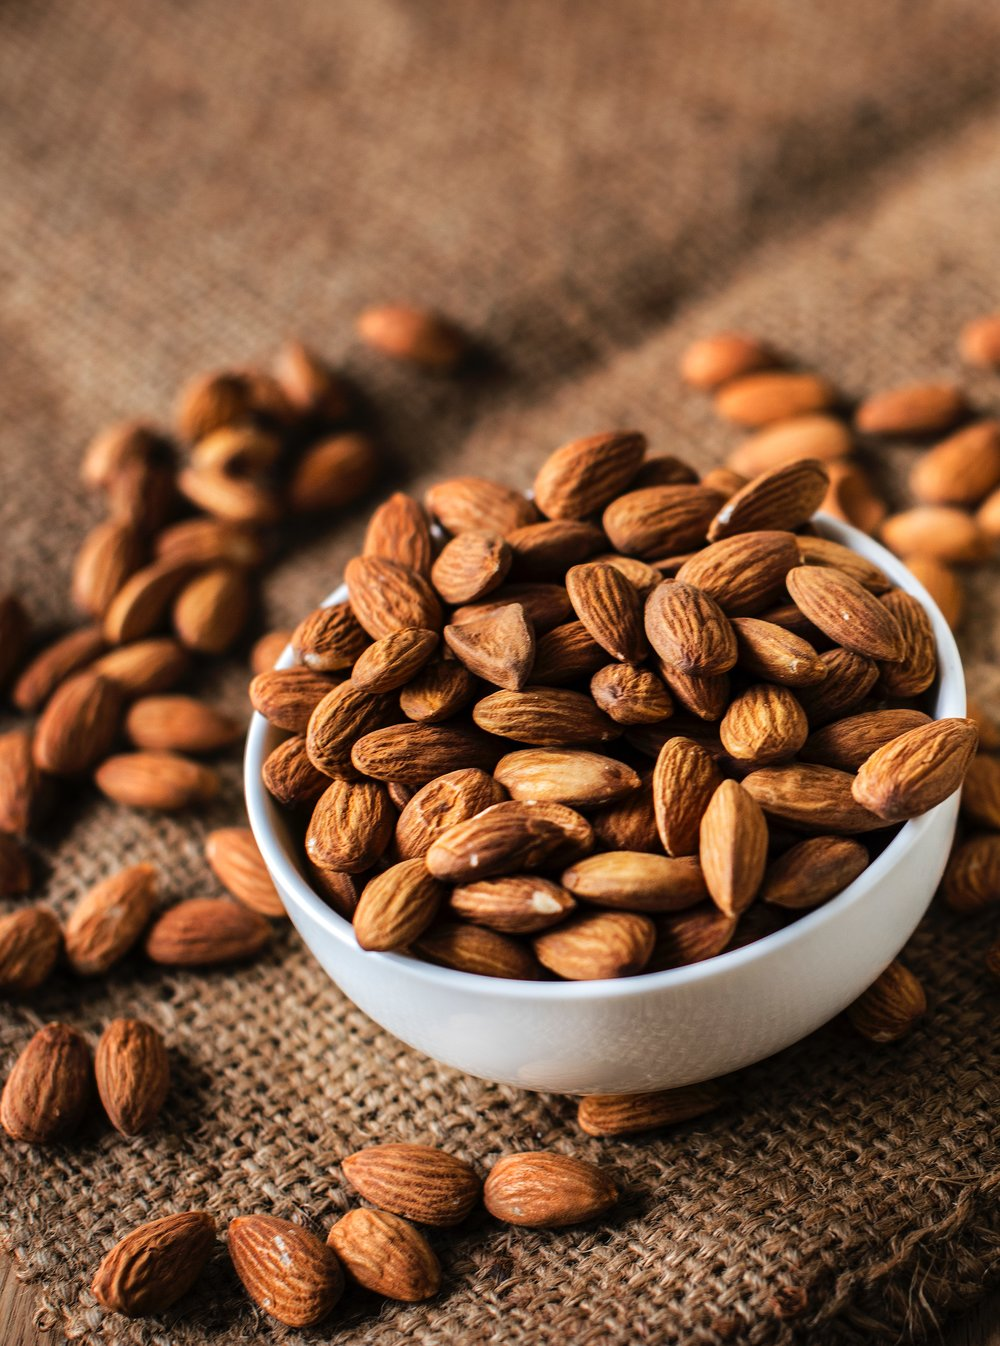 almond-nut-organic-1171555.jpg